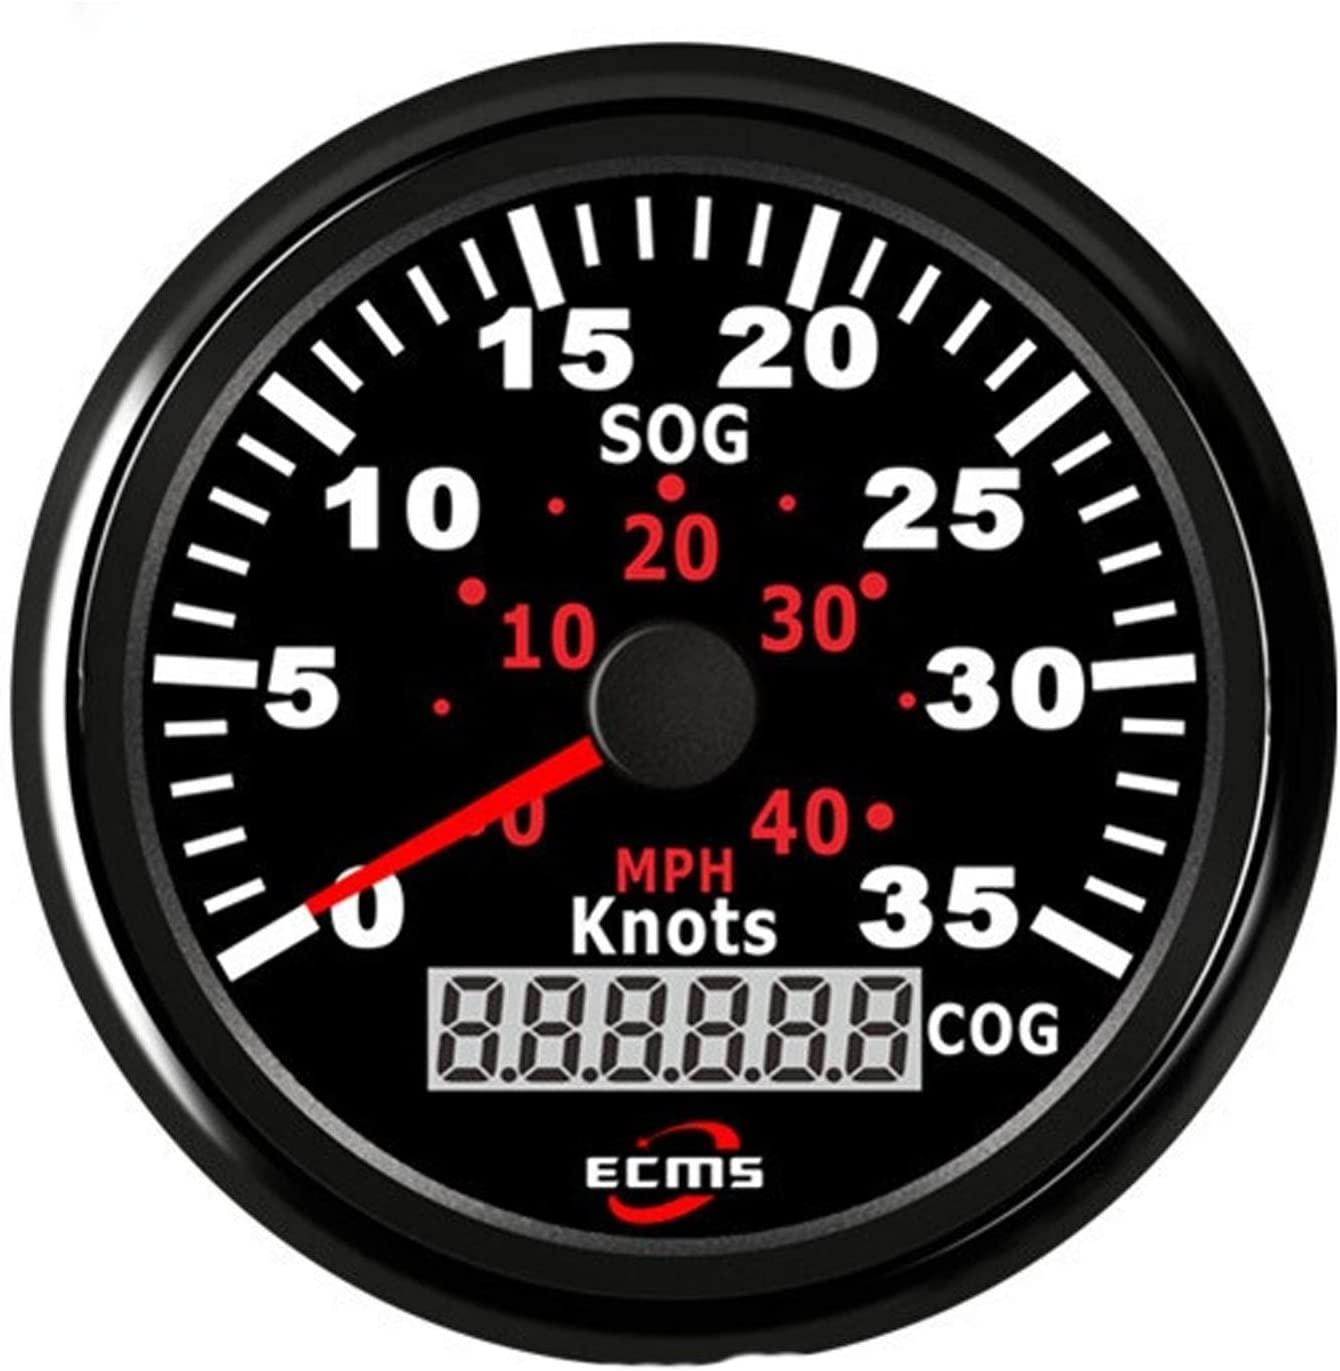 GPS SPEEDOMETER ODOMETER 0-35KNOTS 0-40MPH FOR BOAT YACHT VESSELS BACKLIGHT 3-3 | 8``(85MM) 12V | 24V